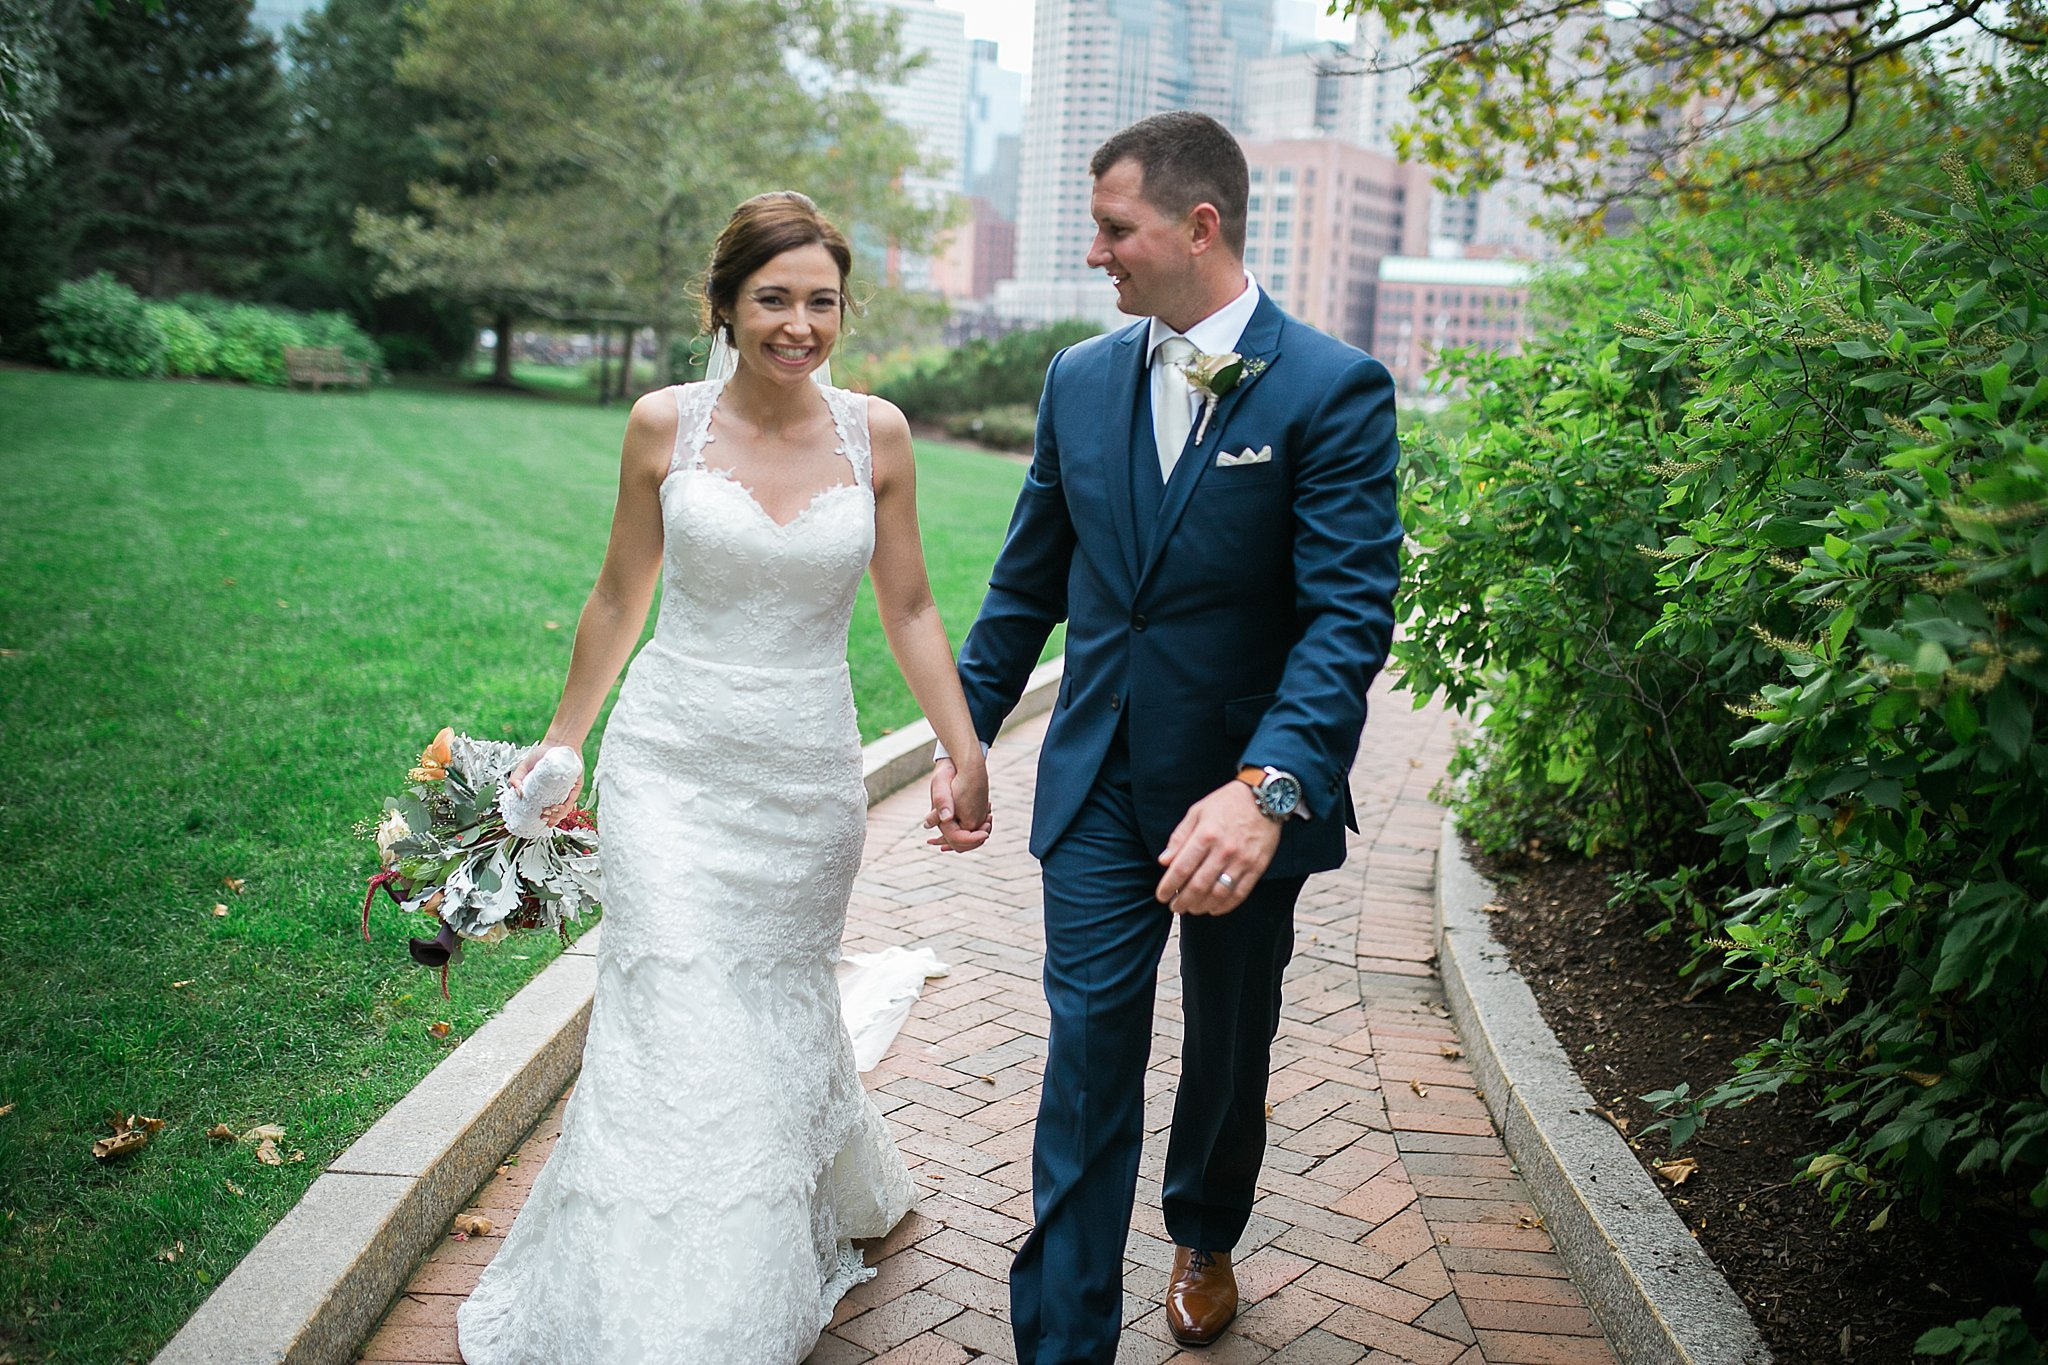 Seaport Hotel Wedding Boston Photographer Sweet Alice46.jpg